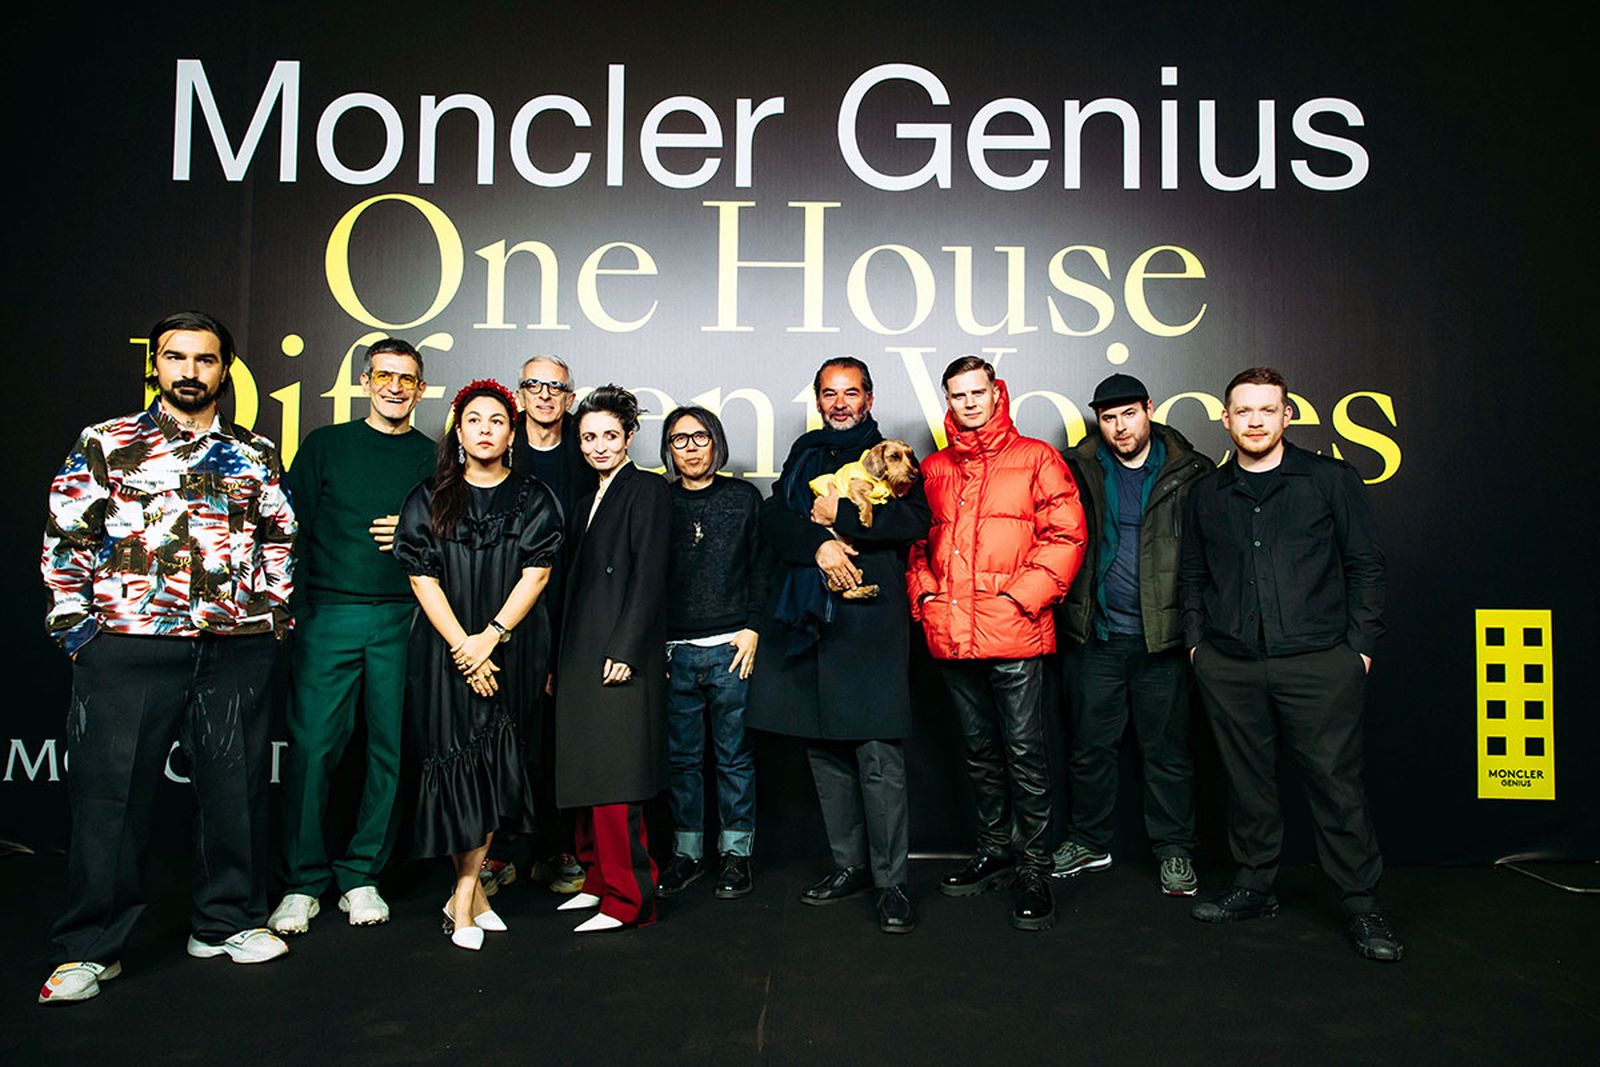 moncler genius fw19 designers all 1017 ALYX 9SM Palm Angels craig green